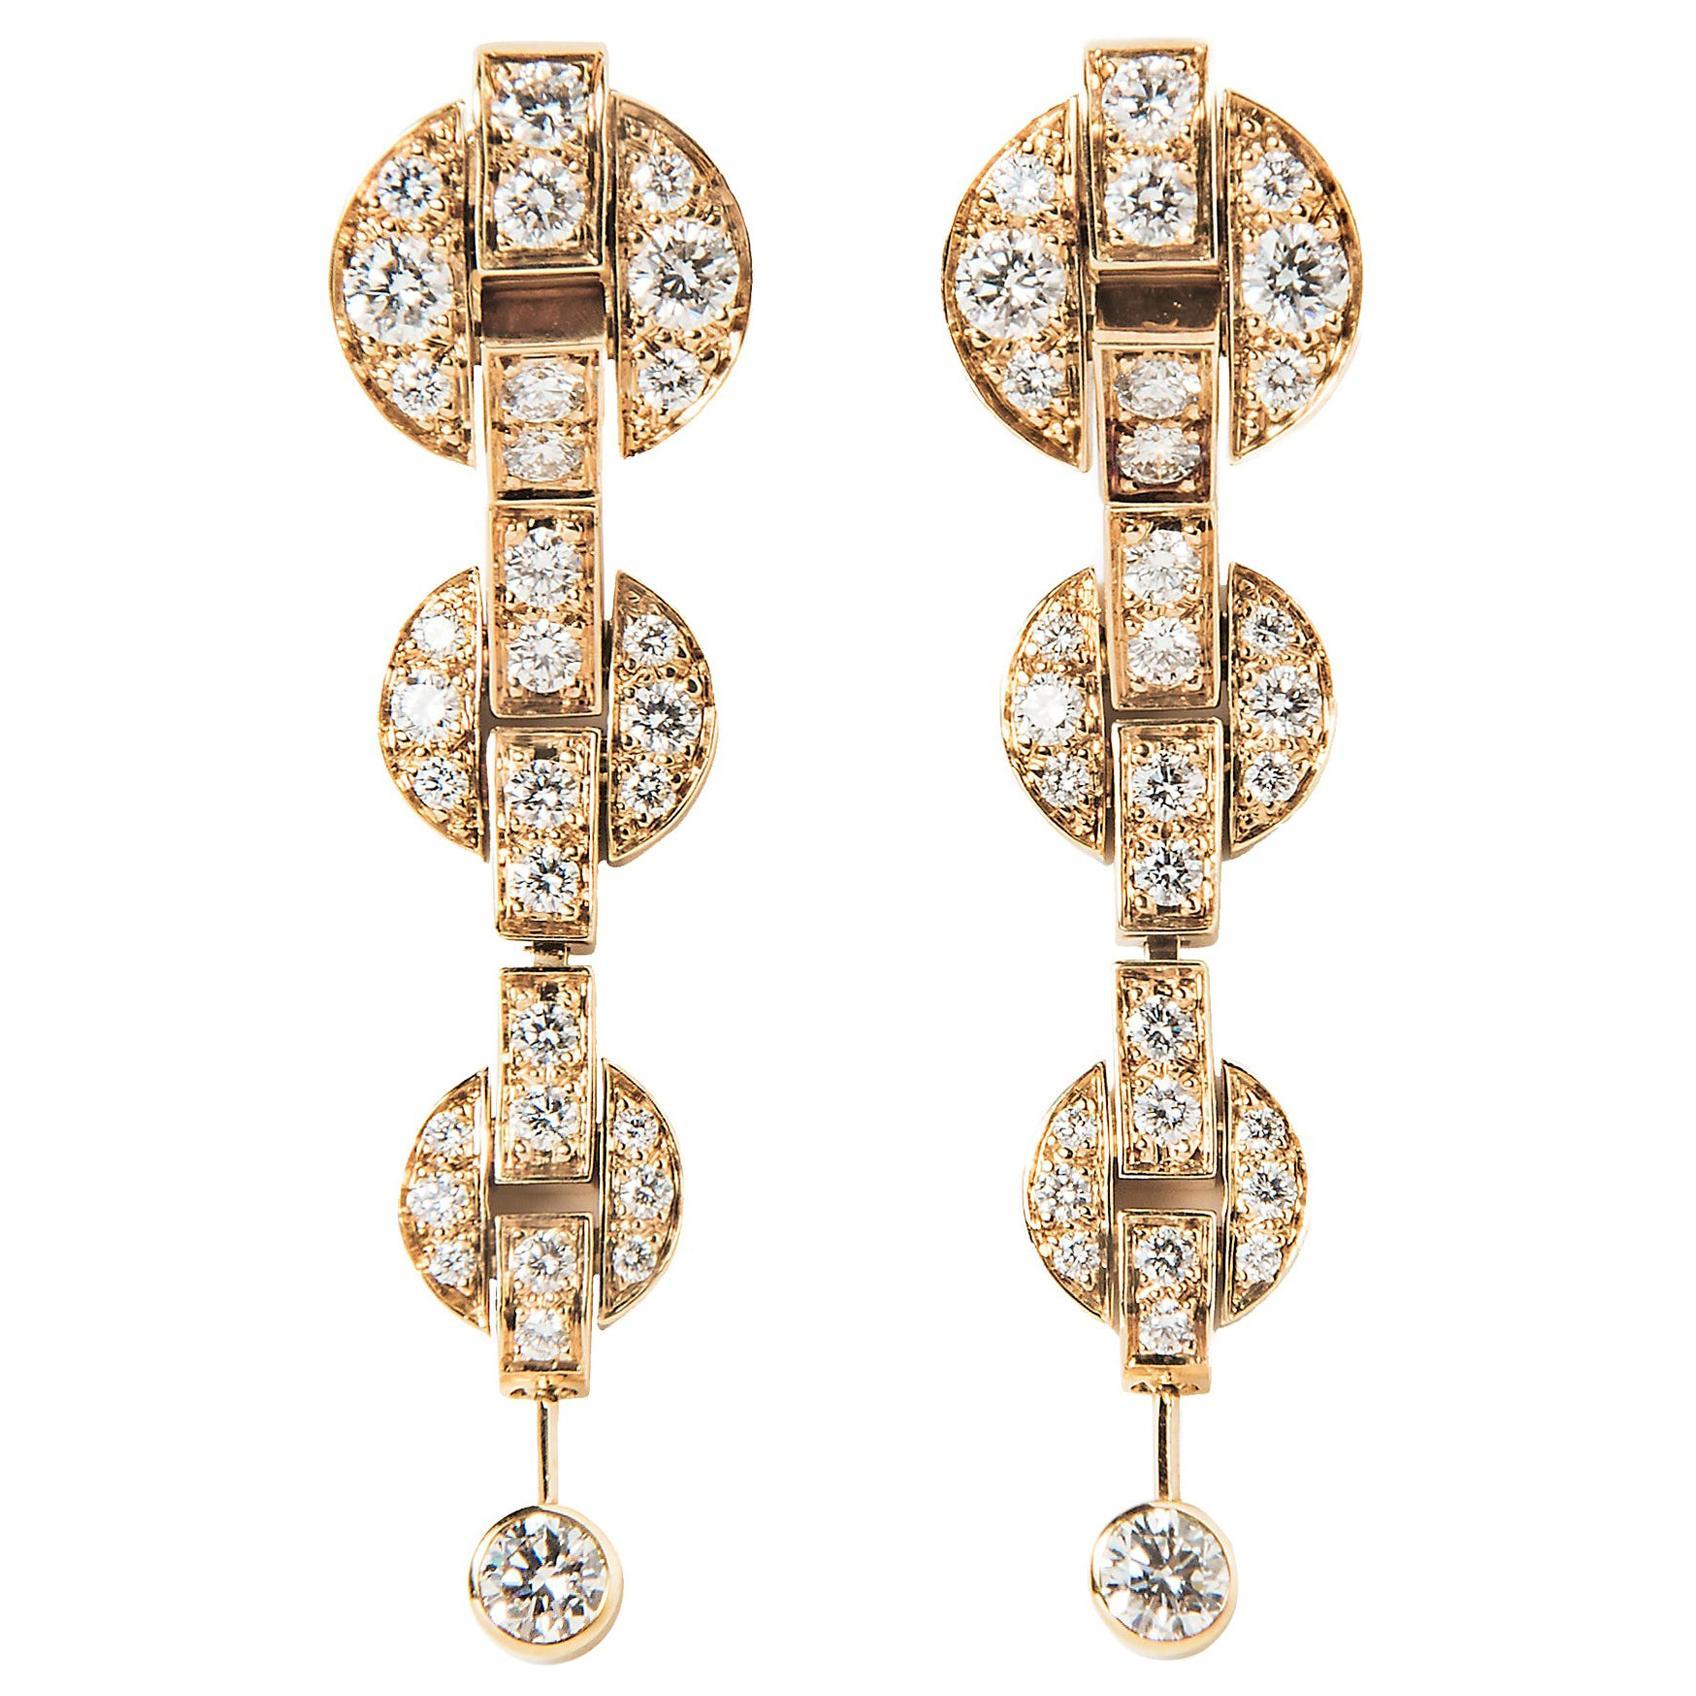 Cartier Himalia Diamond Earrings